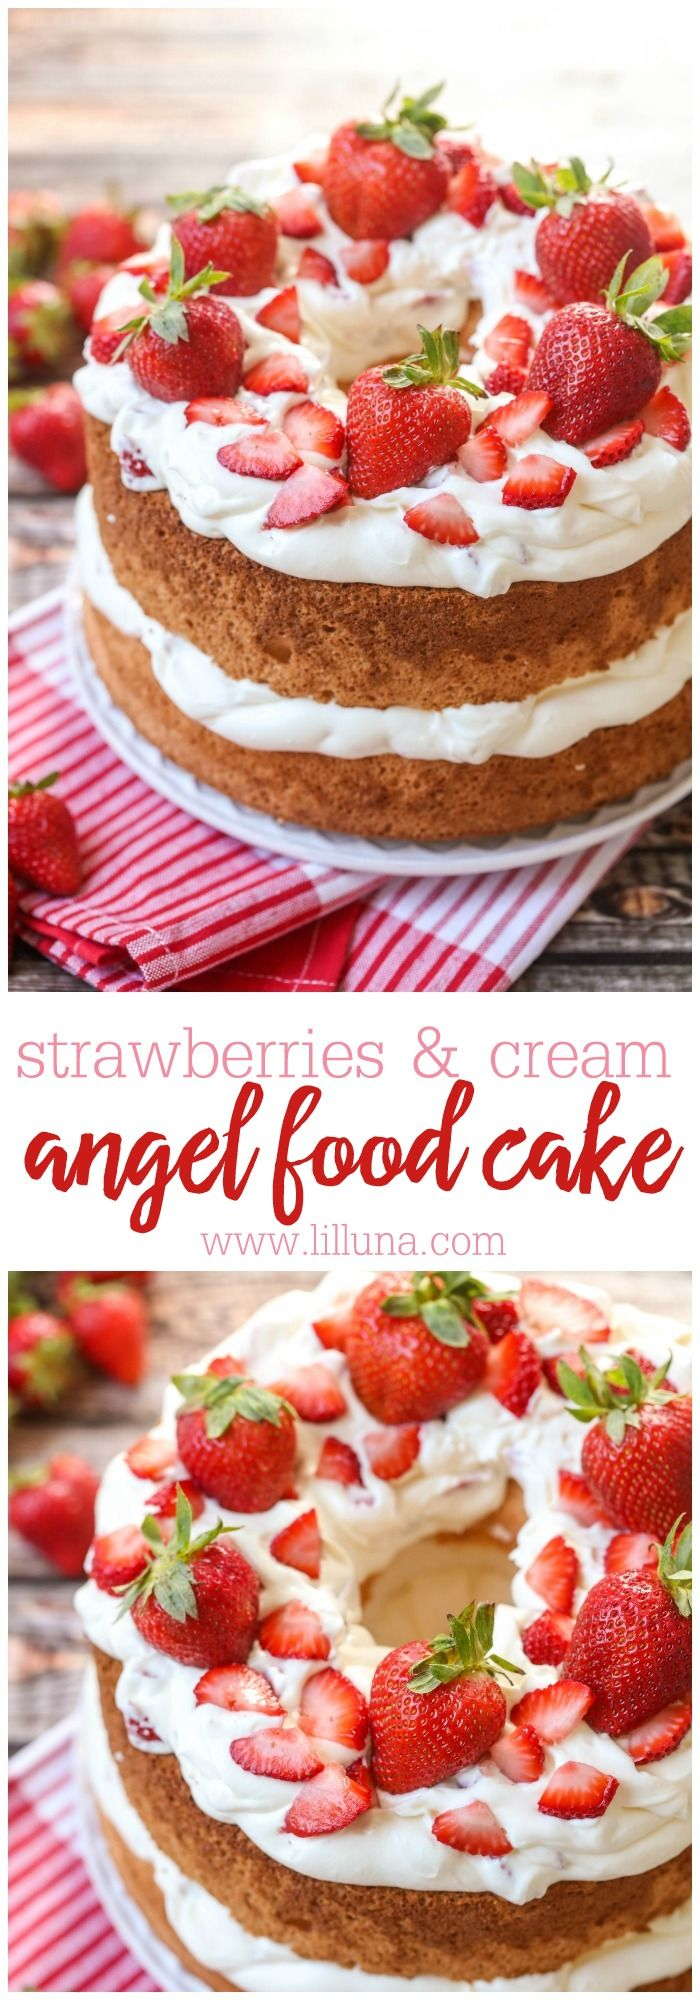 Strawberries And Cream Angel Food Cake Breakfast Biscuits Lil Luna Recipe Angel Food Desserts Cake Recipes